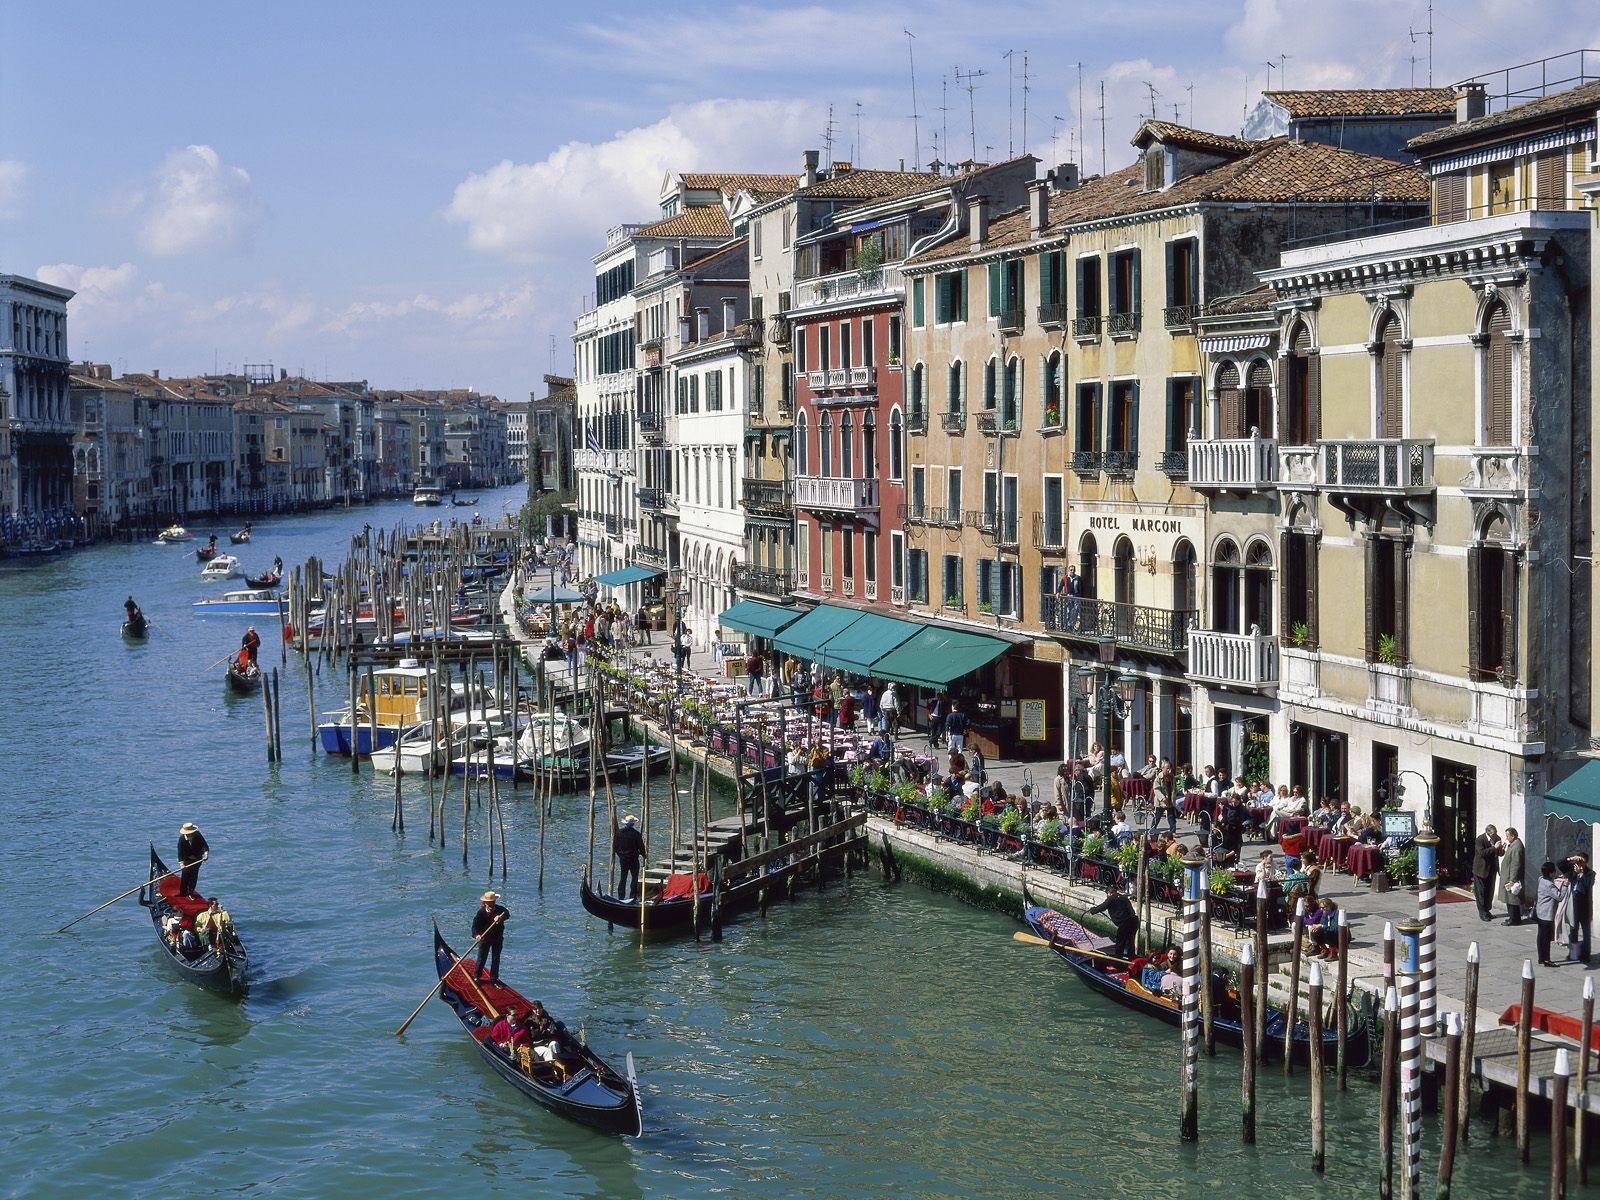 http://2.bp.blogspot.com/-gPRKzJYVnyQ/Tcp4waT_RJI/AAAAAAAACYE/h4f9lrbnsgM/s1600/The+Grand+Canal+of+Venice%252C+Italy.jpg